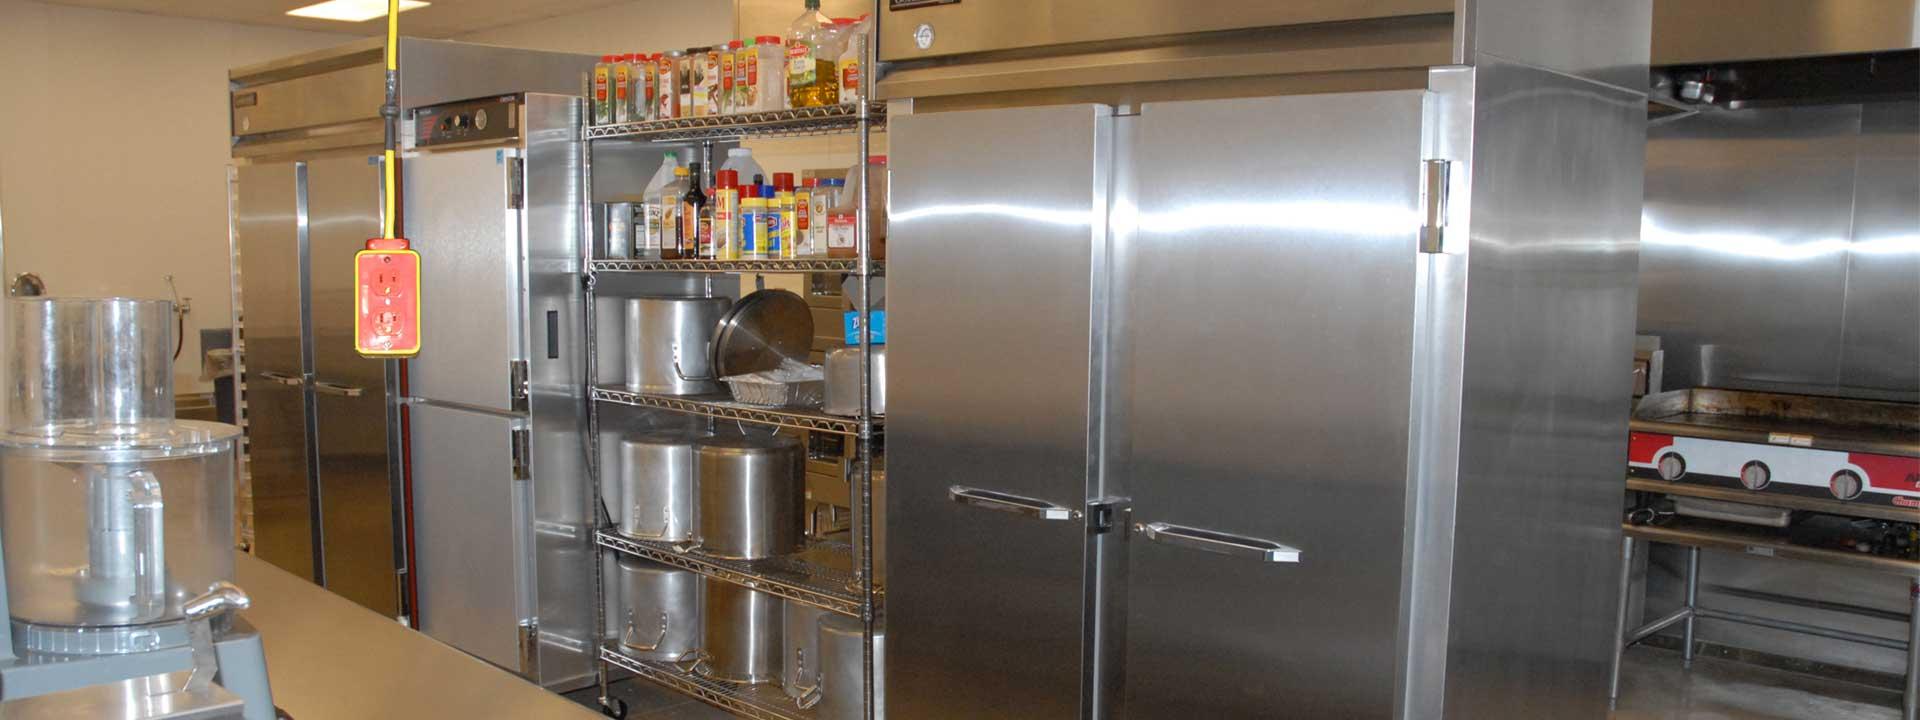 Etonnant Commercial Kitchen Cord Reels For Drop Down Power! U2013 Kitchen ...